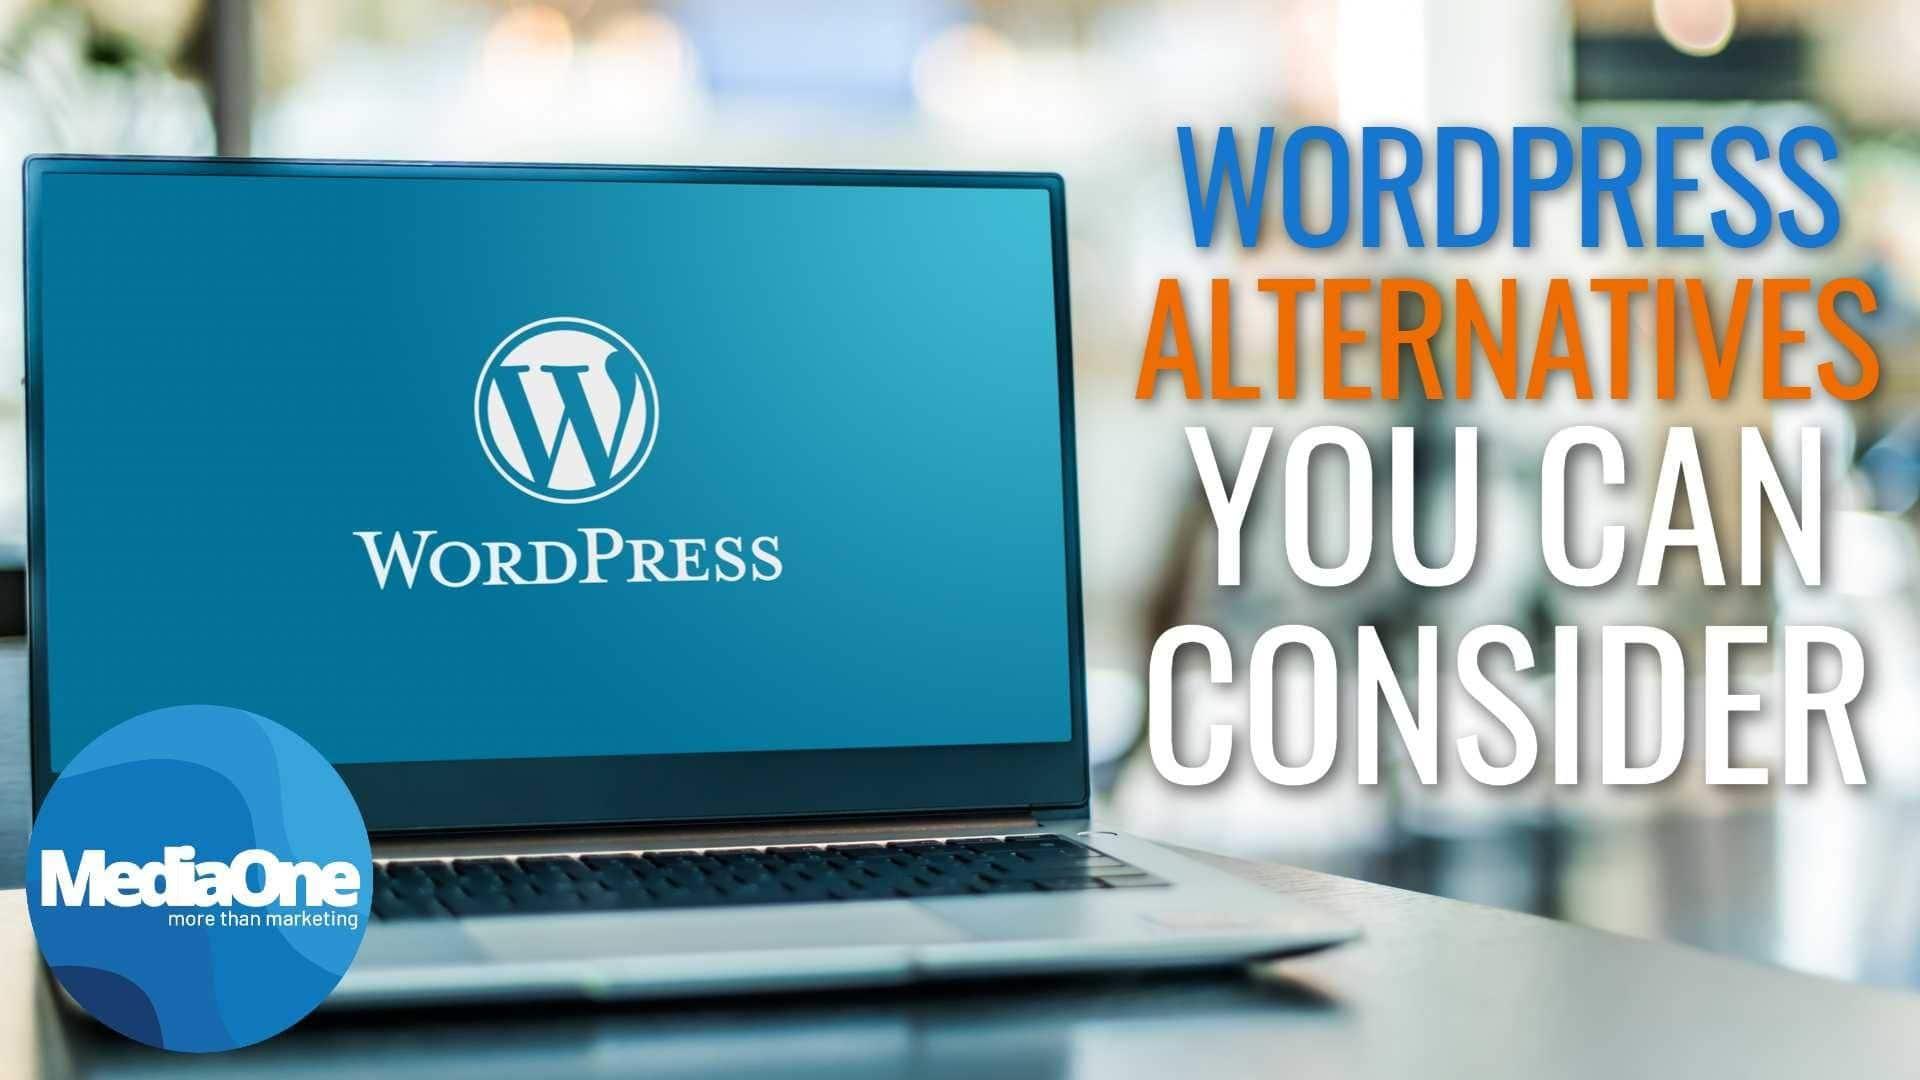 21 WordPress Alternatives You Can Consider 1